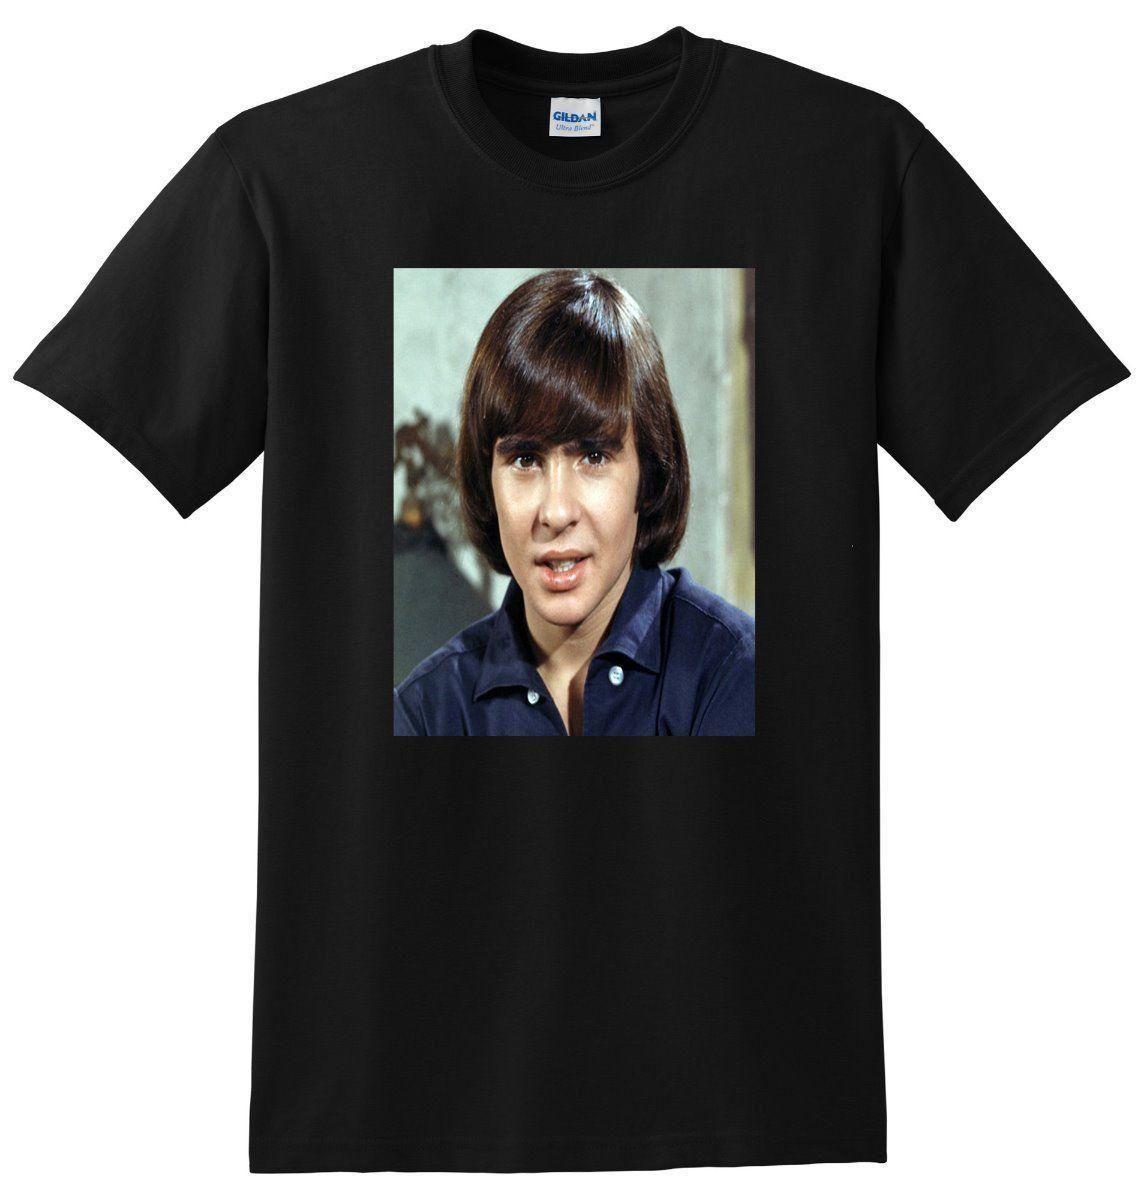 6fa84900d DAVY JONES T SHIRT The Monkees Photo Poster Tee SMALL MEDIUM LARGE Or XL  Tourist Shirts Of T Shirt From Zhangjingxin22, $15.7  DHgate.Com